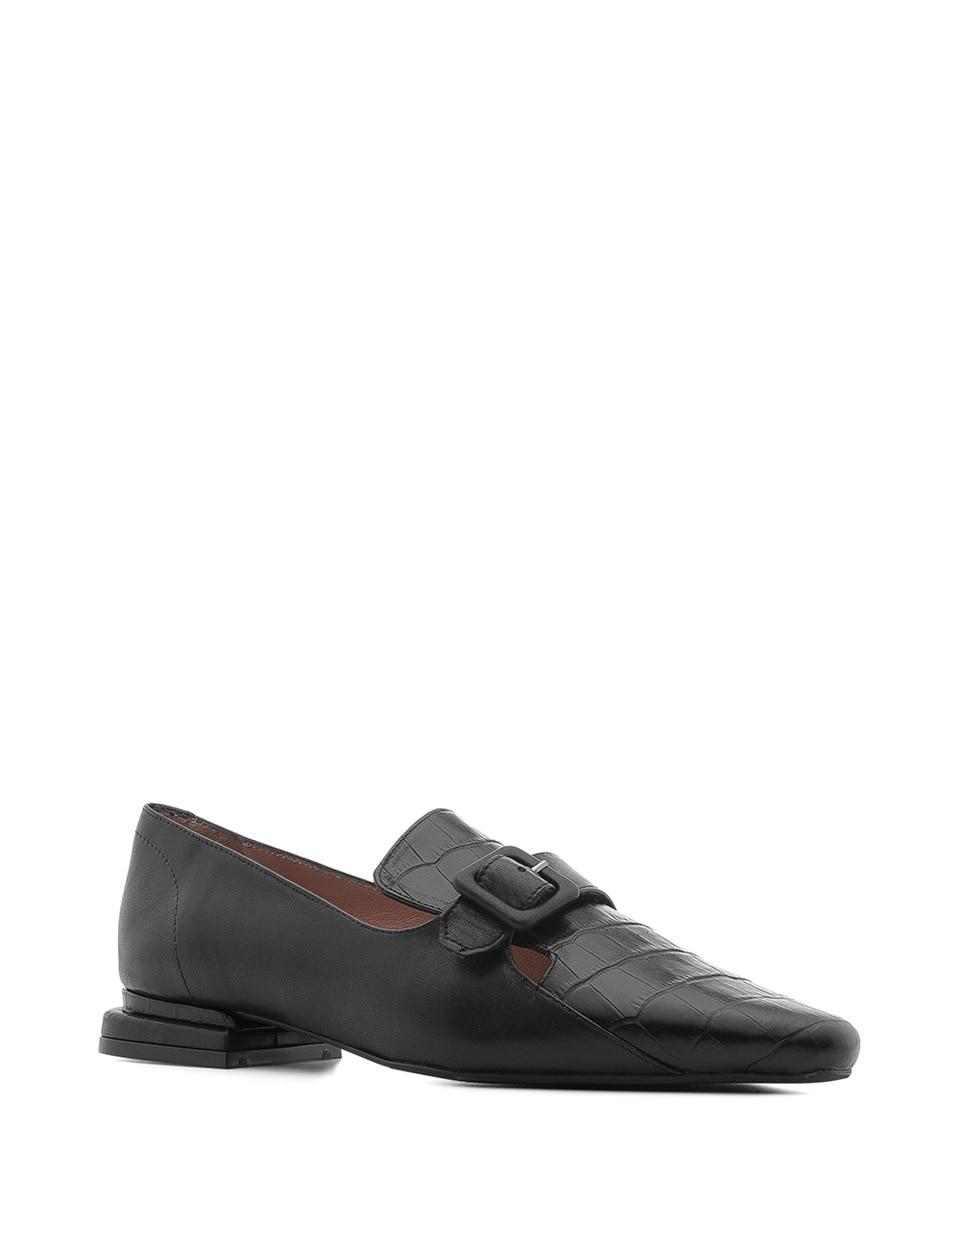 ILVi-Handmade Genuine Leather Regina Women's Moccasin Black Crocodile-Black Leather 2020 Women Shoes for Spring Summer